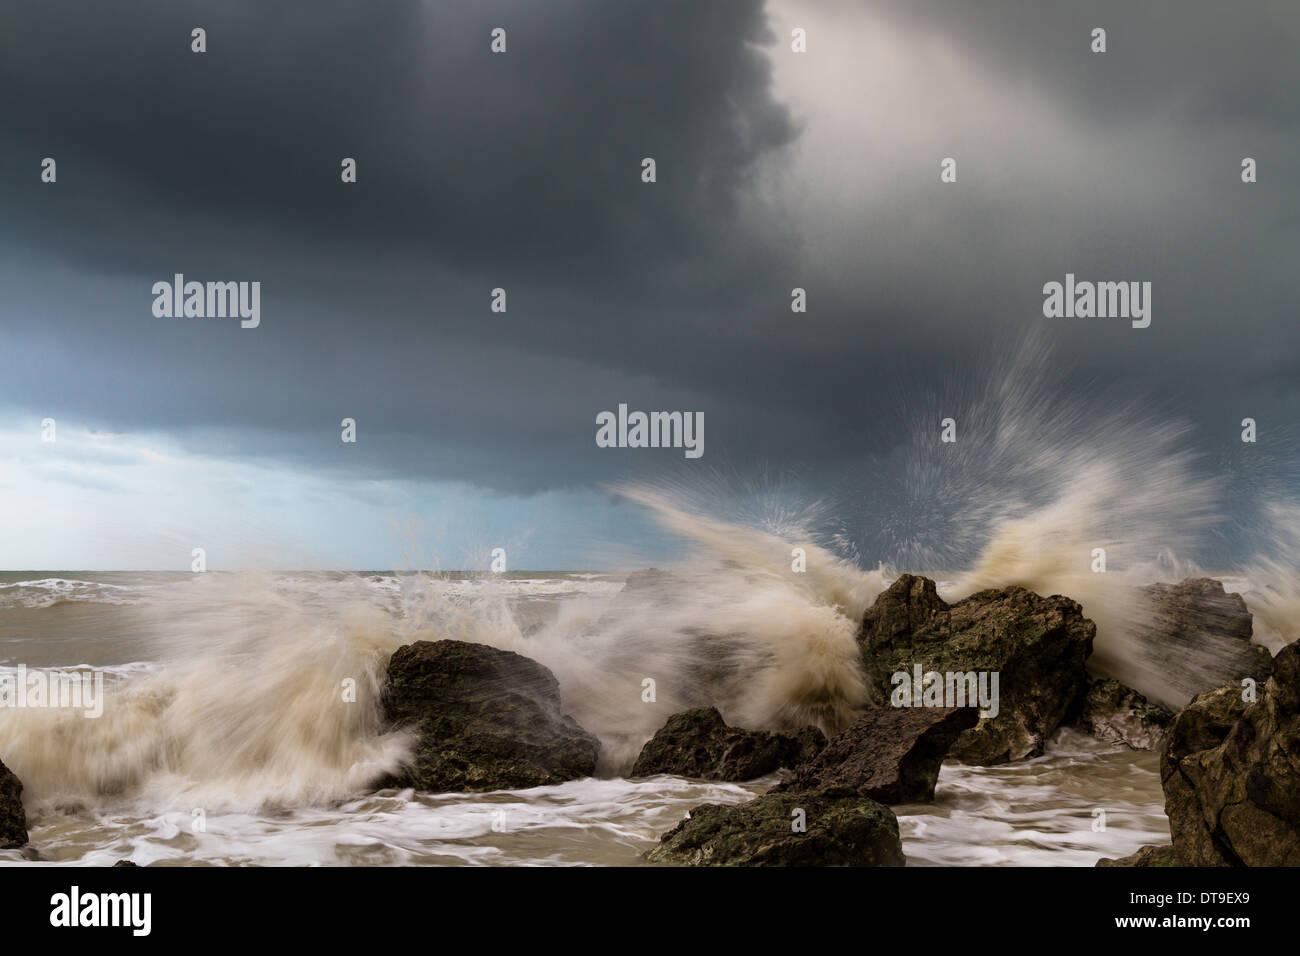 Waves crashing around rocks during a storm Stock Photo